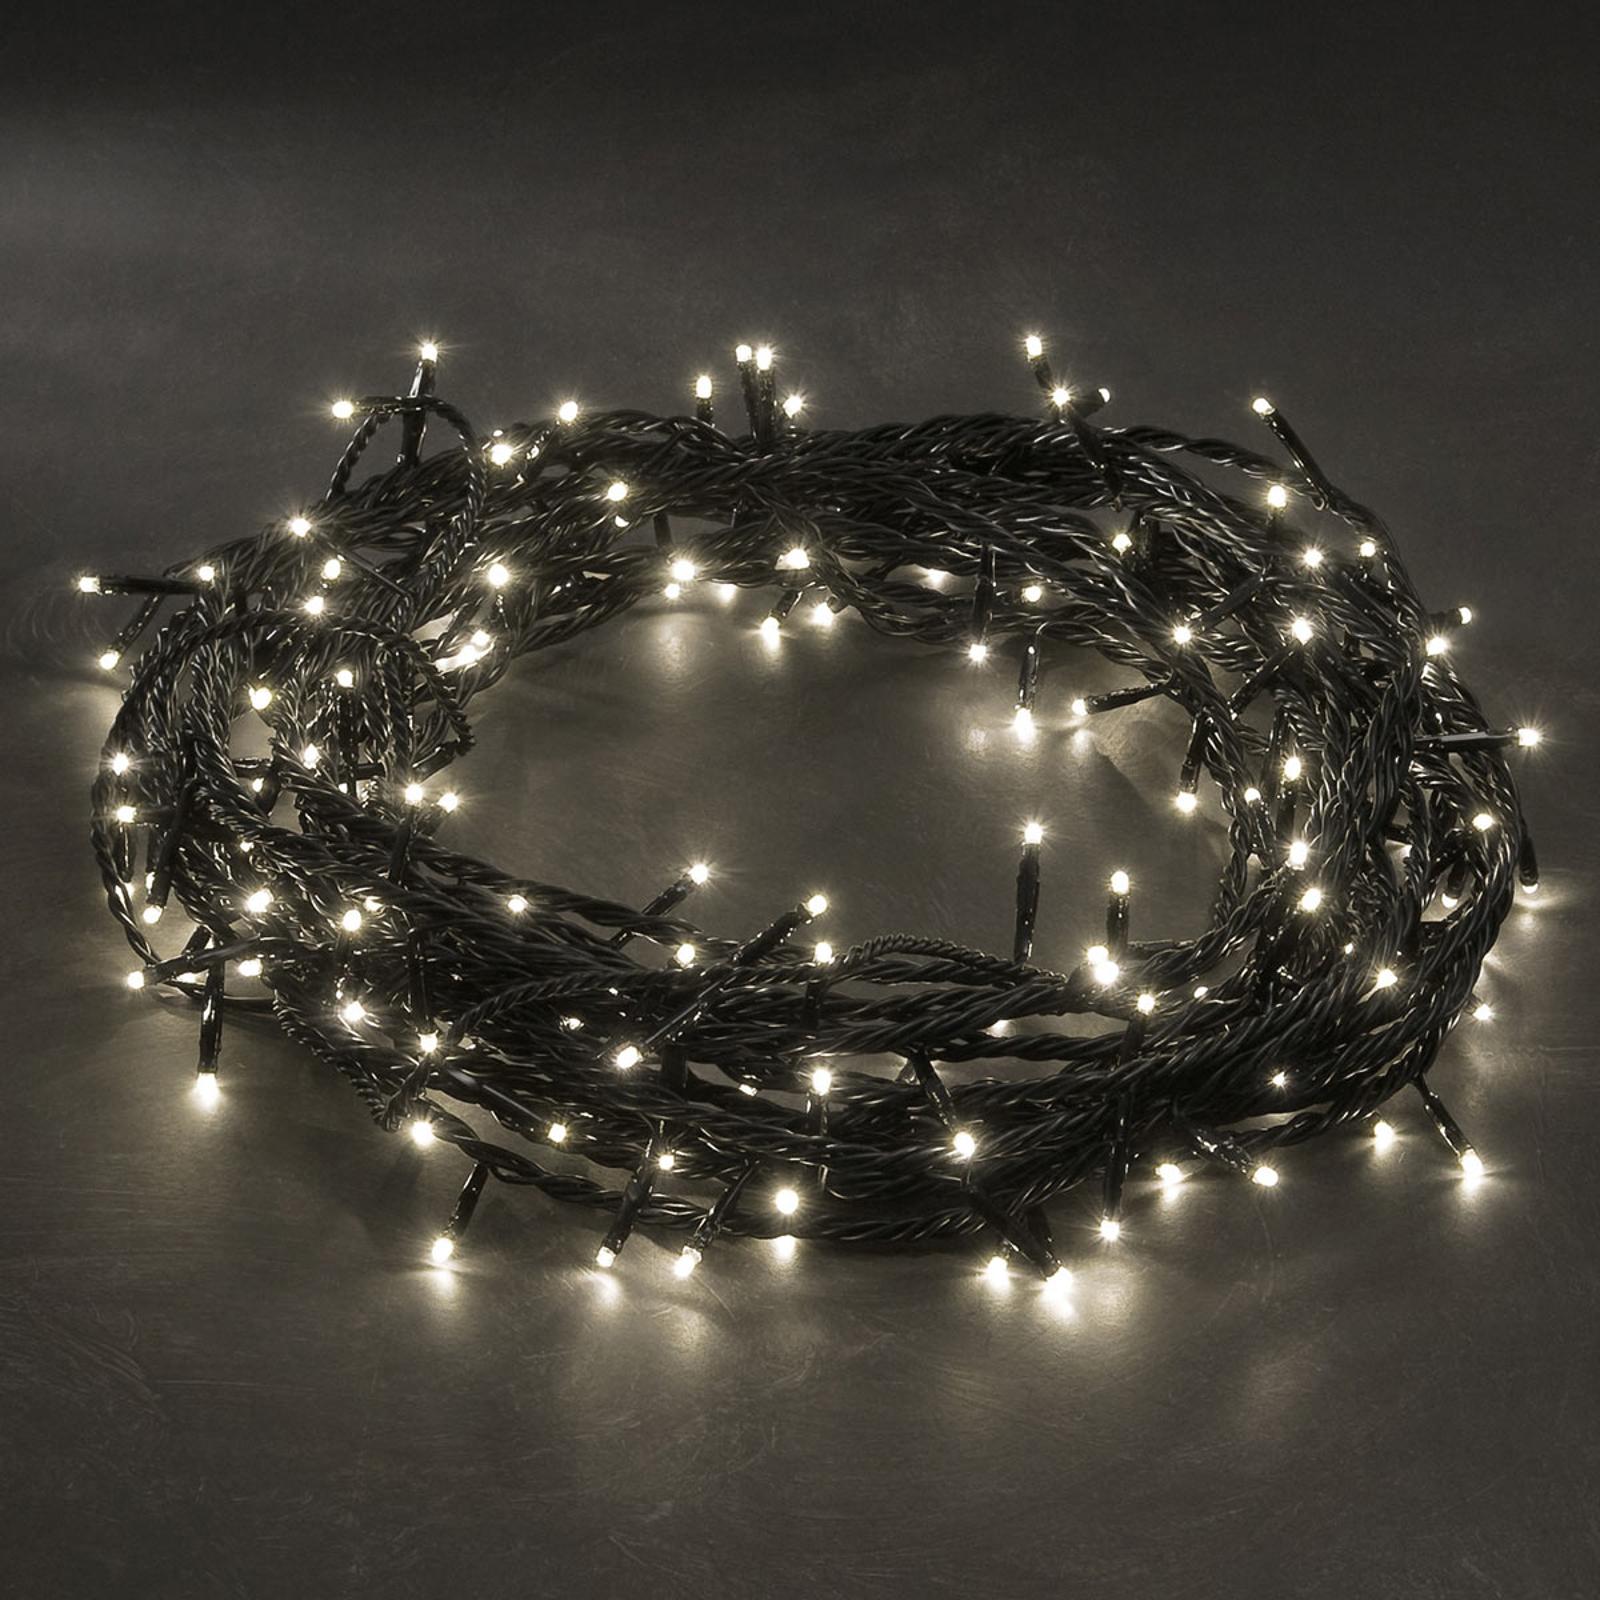 LED-Microlichterkette warmweiß 180-flammig 17,5m